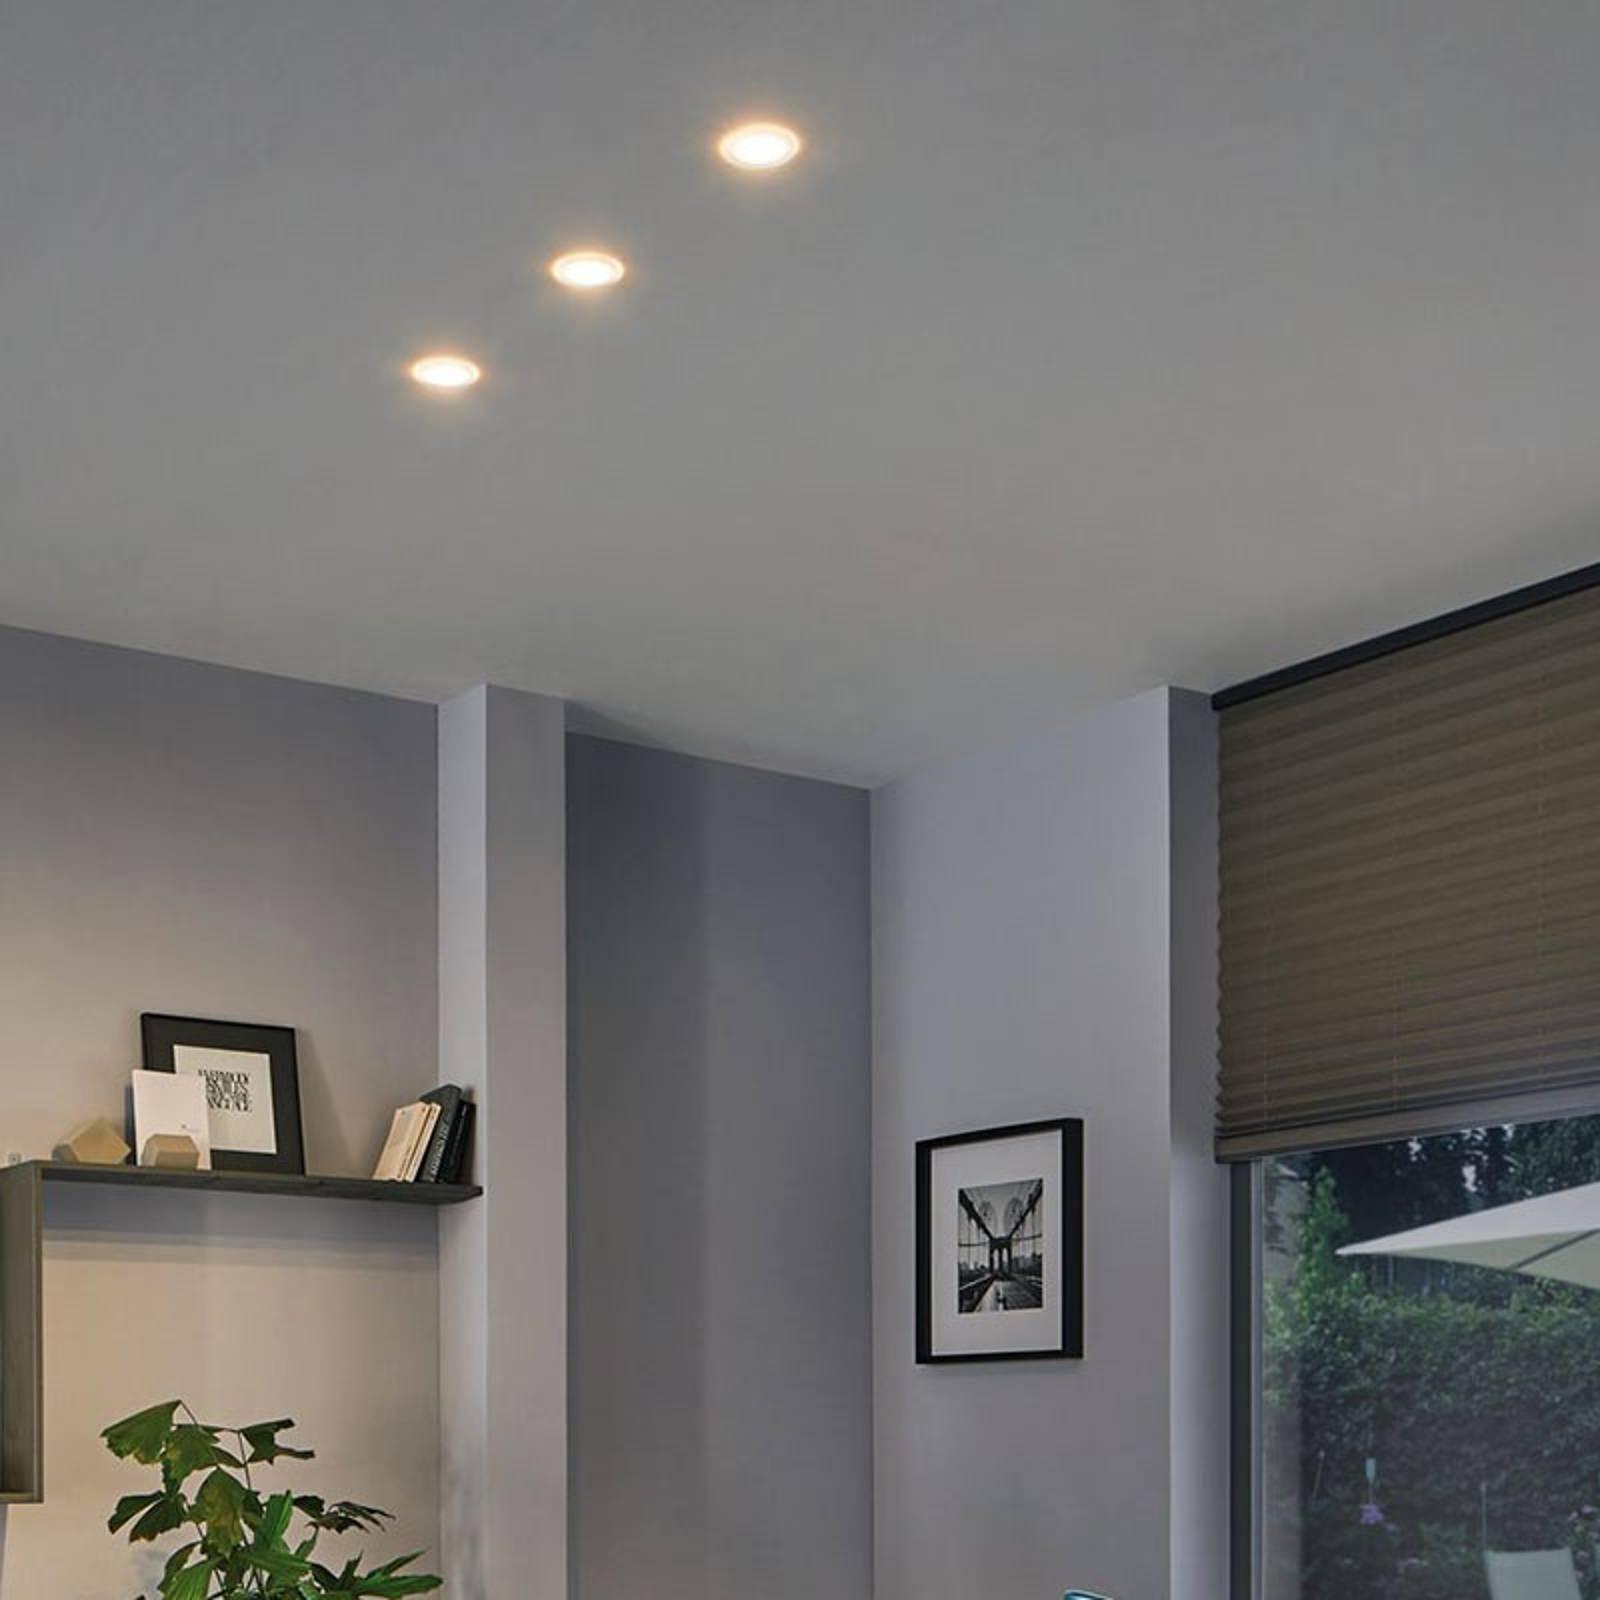 Paulmann Suon 3 luminaires encastrés LED, dimmable